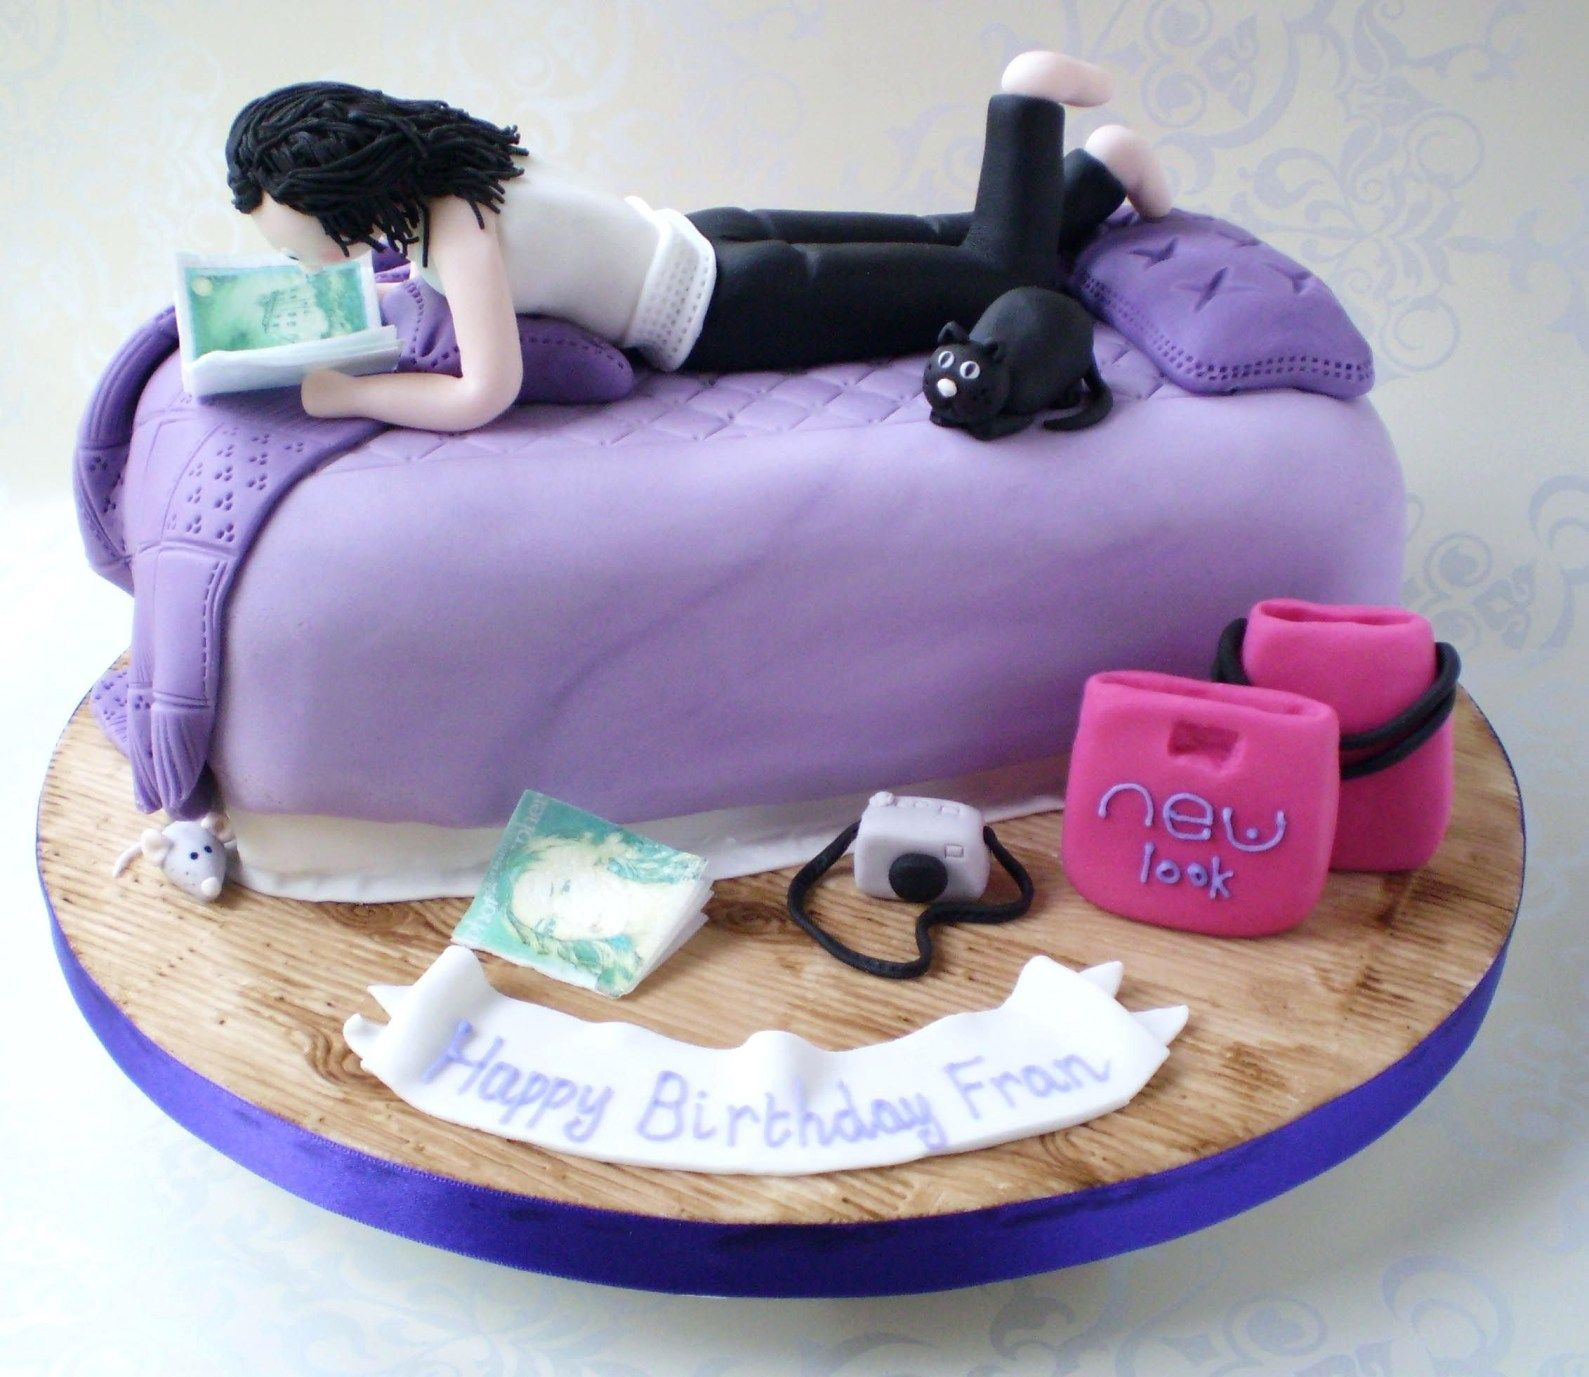 Miraculous 25 Awesome Photo Of Teenage Girl Birthday Cakes Birthday Cake Personalised Birthday Cards Veneteletsinfo